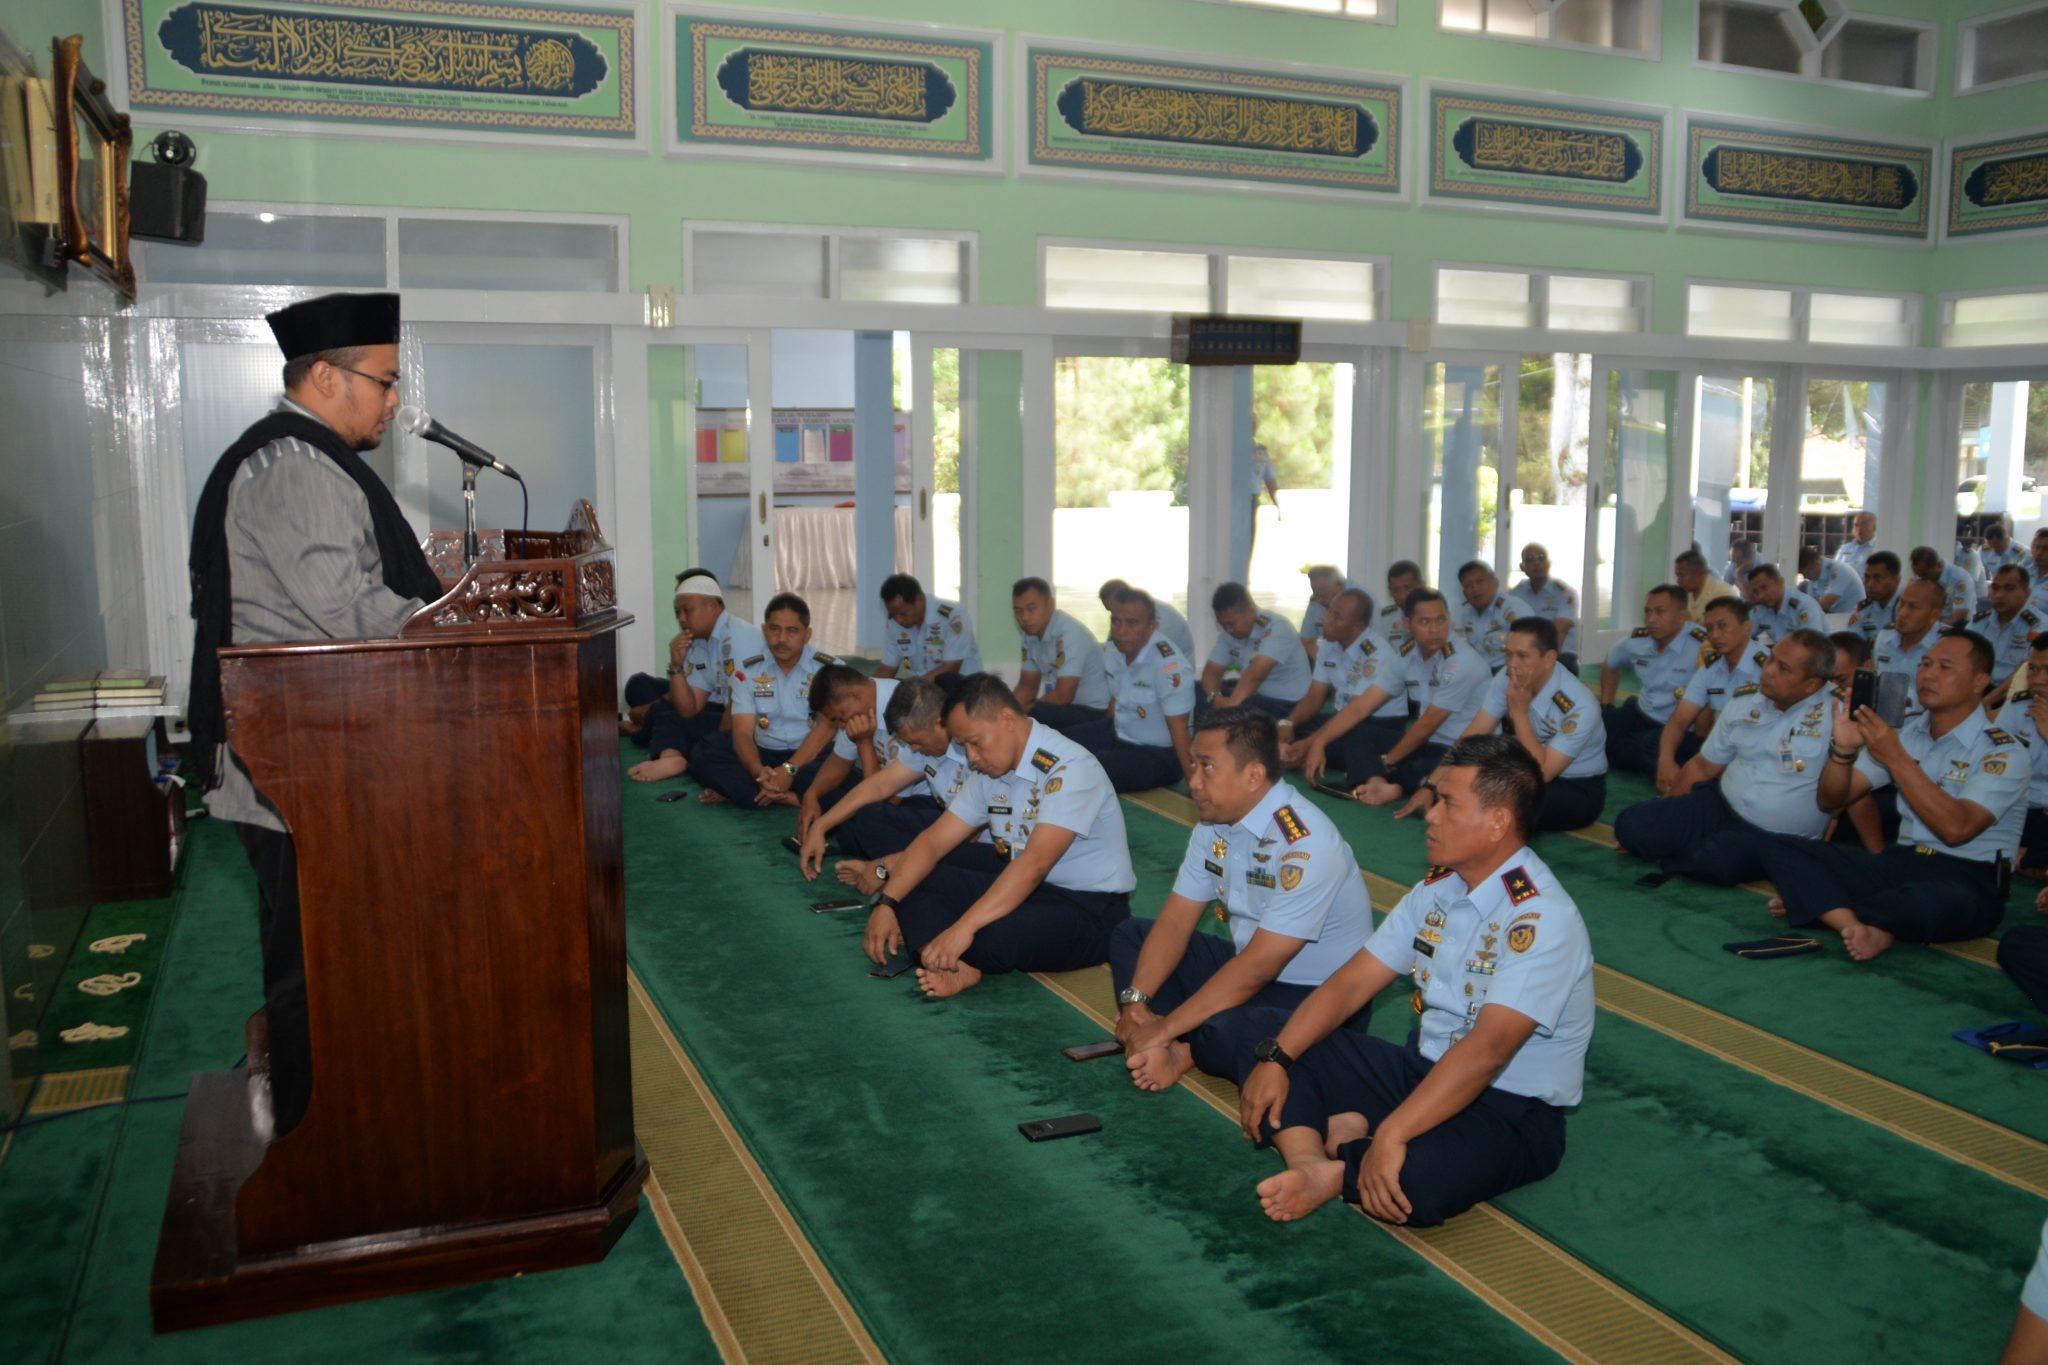 Jadikan Hikmah Maulid Nabi Muhammad SAW sebagai Suri Tauladan